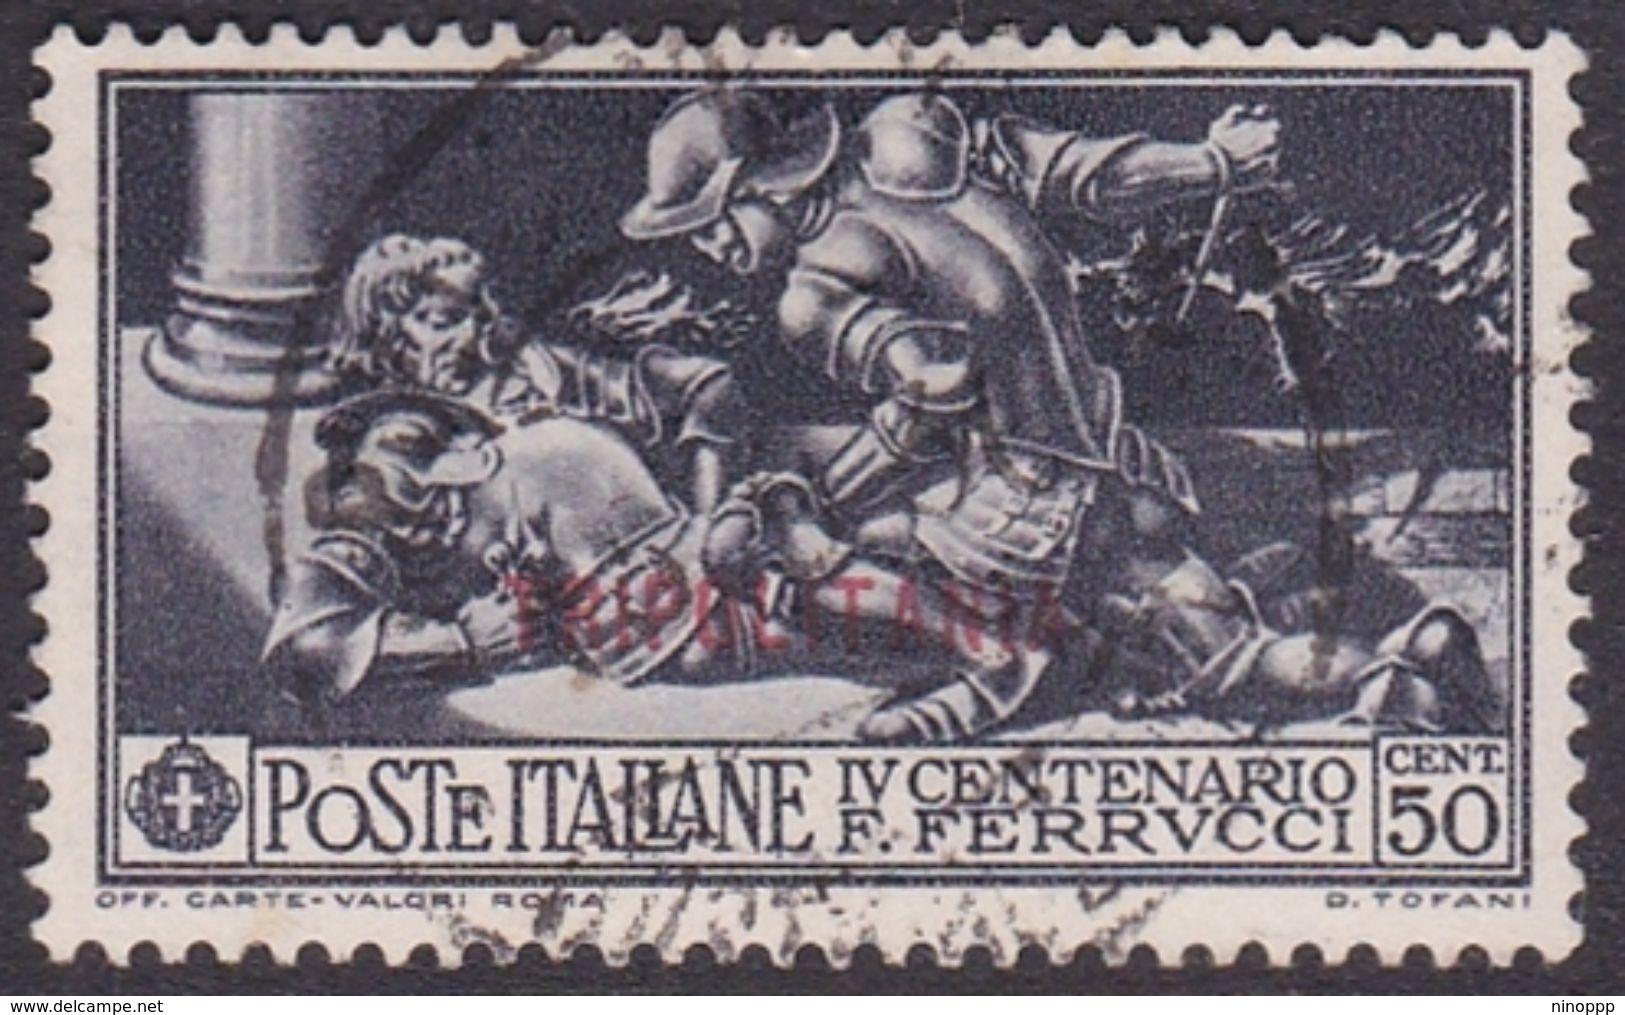 Italy-Colonies And Territories-Tripolitania S66 1930 Ferrucci,50c Black,used - Tripolitania